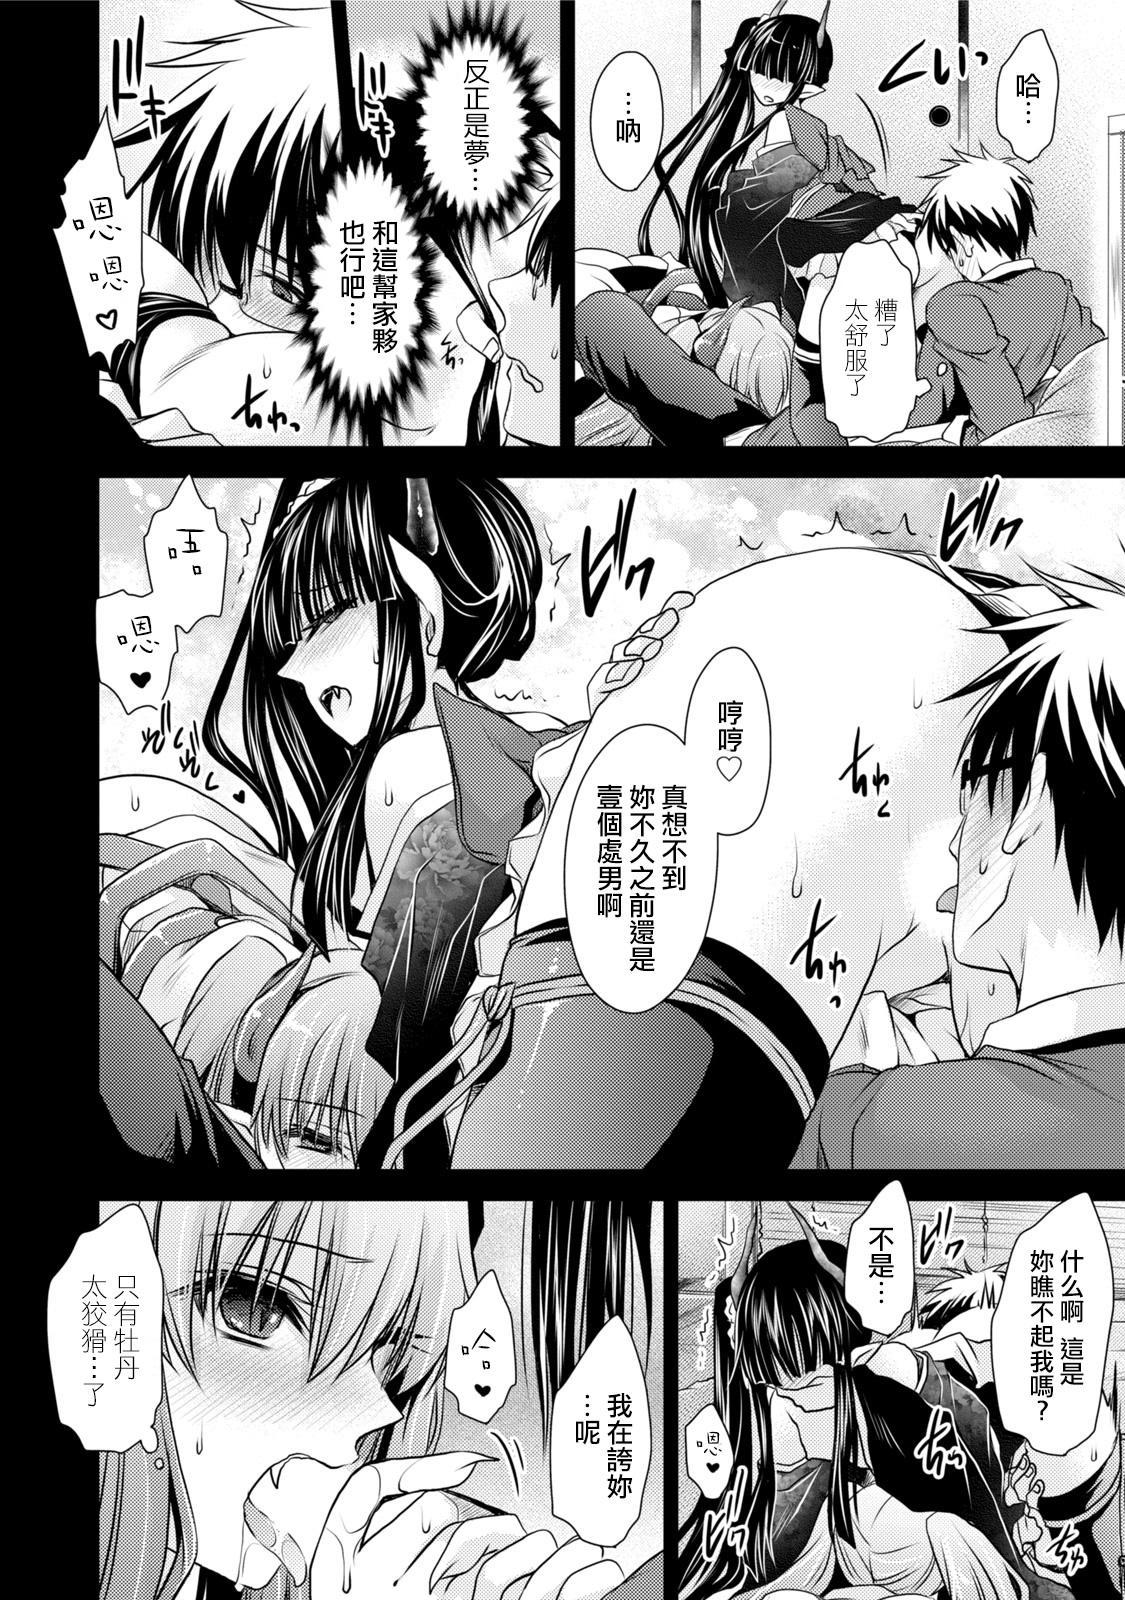 [Shinonome Ryu] Ore to Kanojo to Owaru Sekai - World's end LoveStory ch.1-9 [Chinese] [爱弹幕汉化组] [Digital] 143